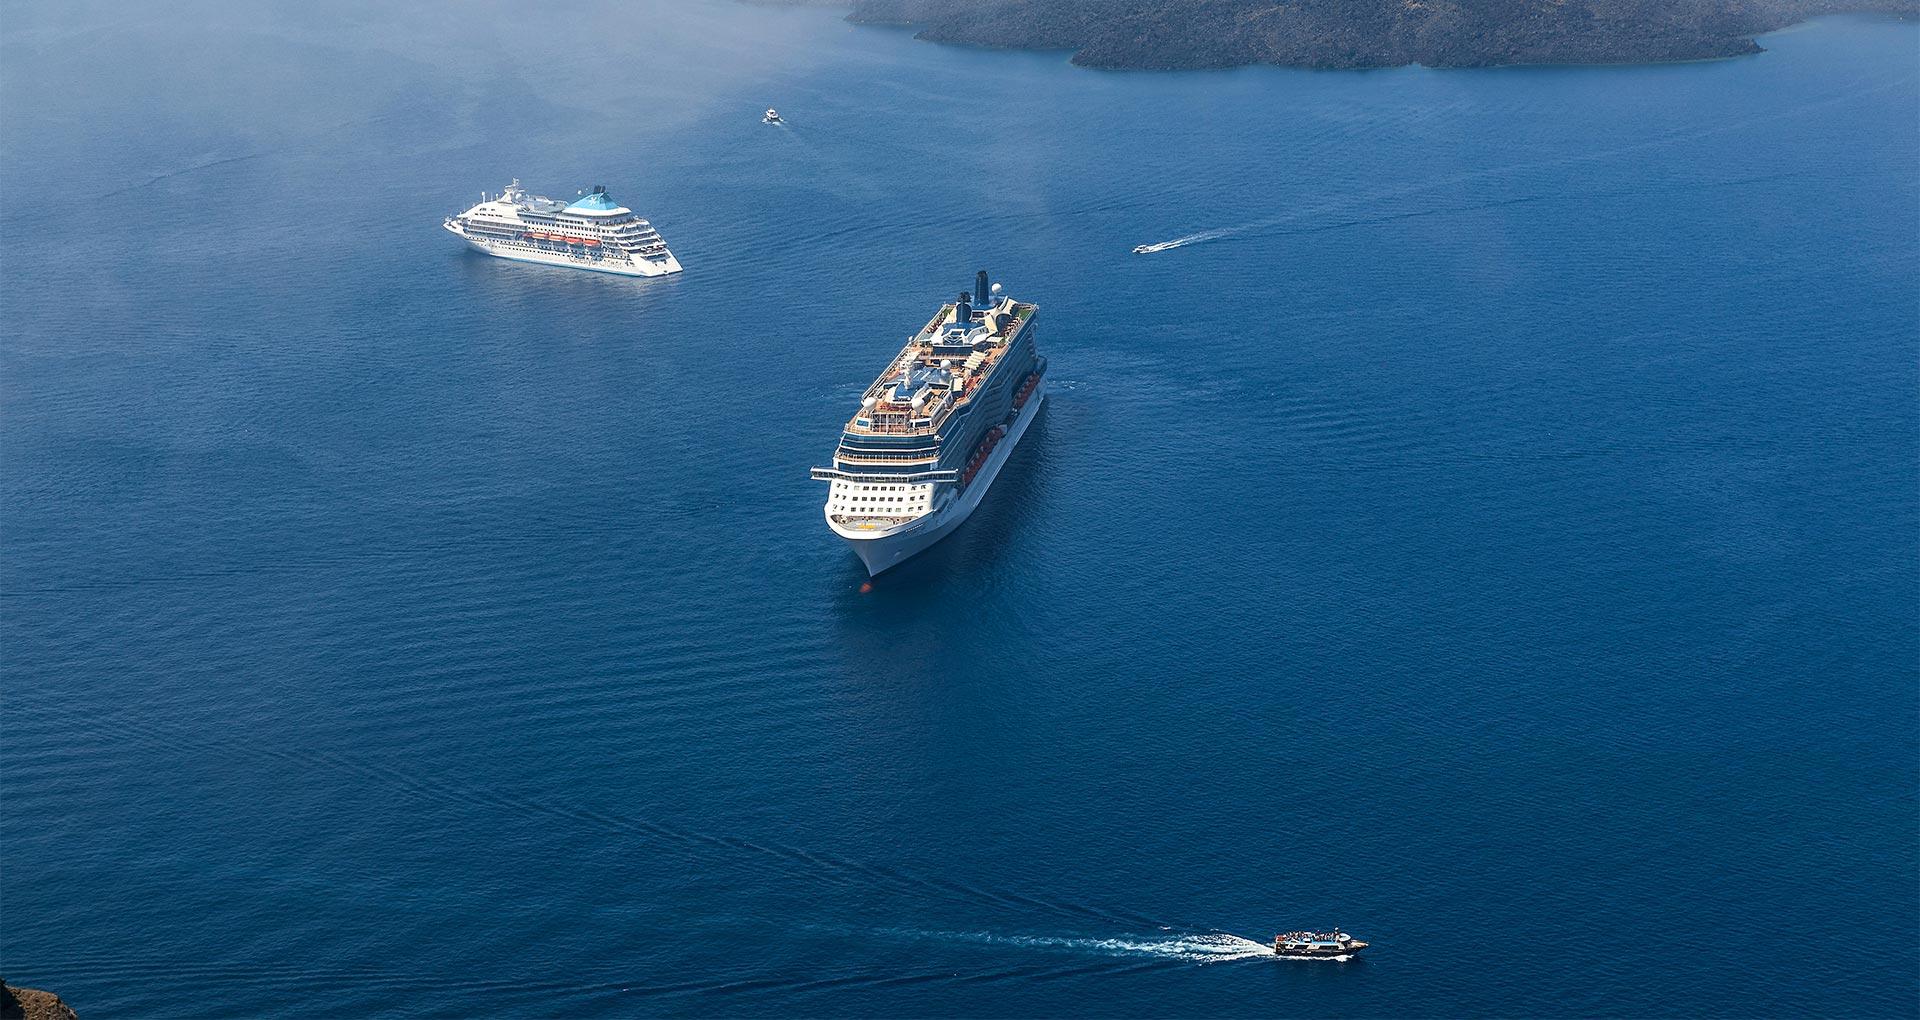 honeymoon jacuzzi suites private balcony santorini bluedolphins sl4